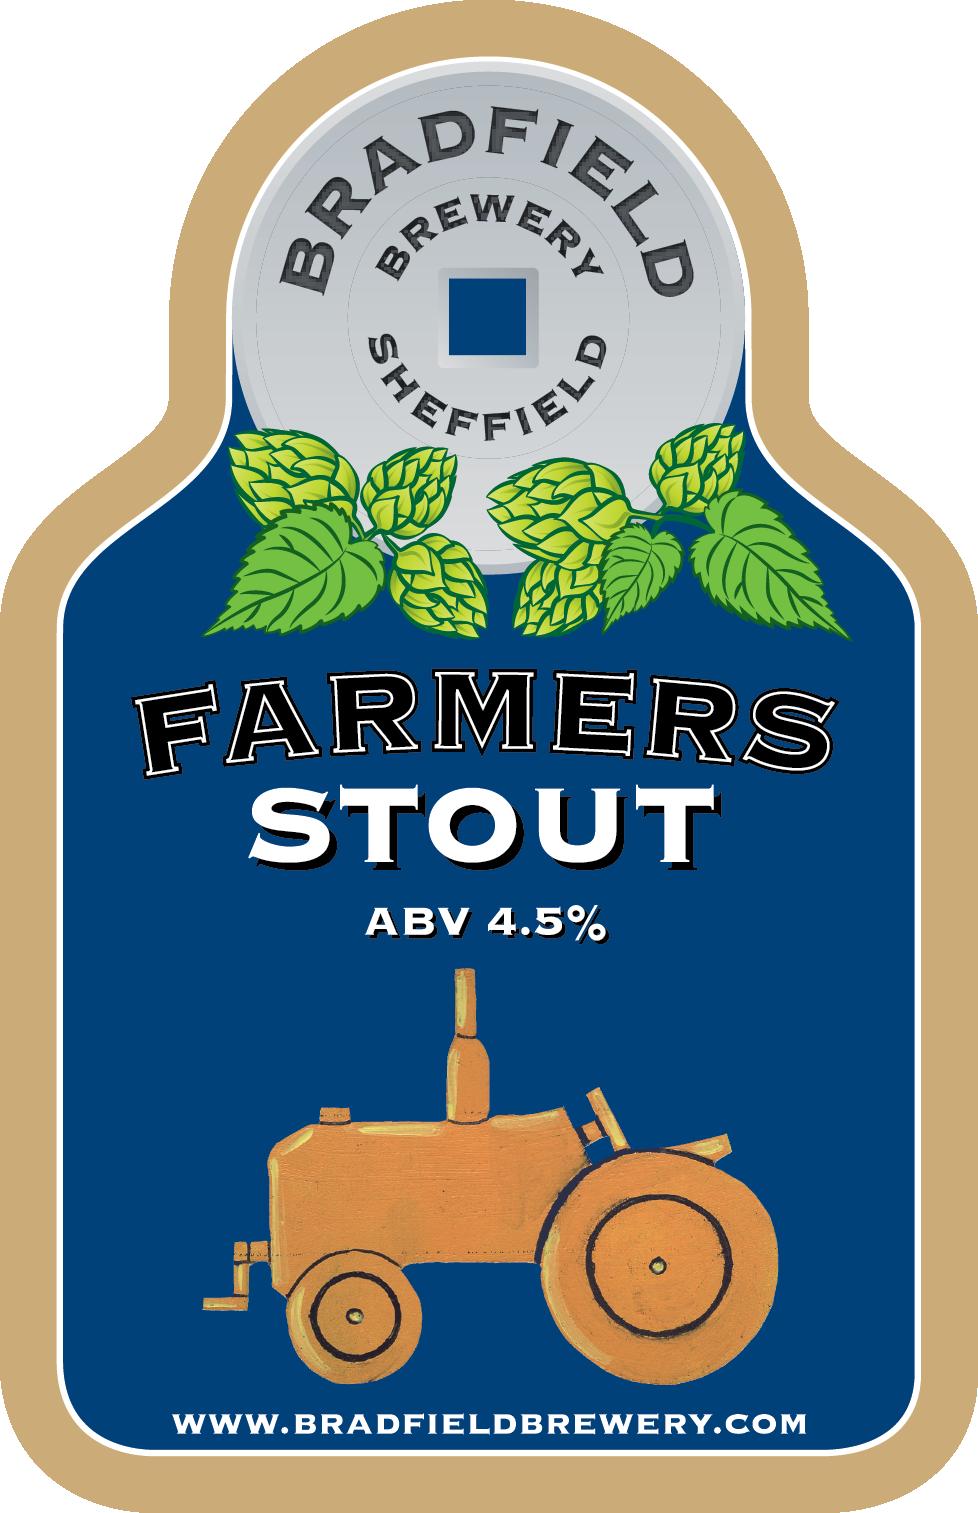 Farmers Stout